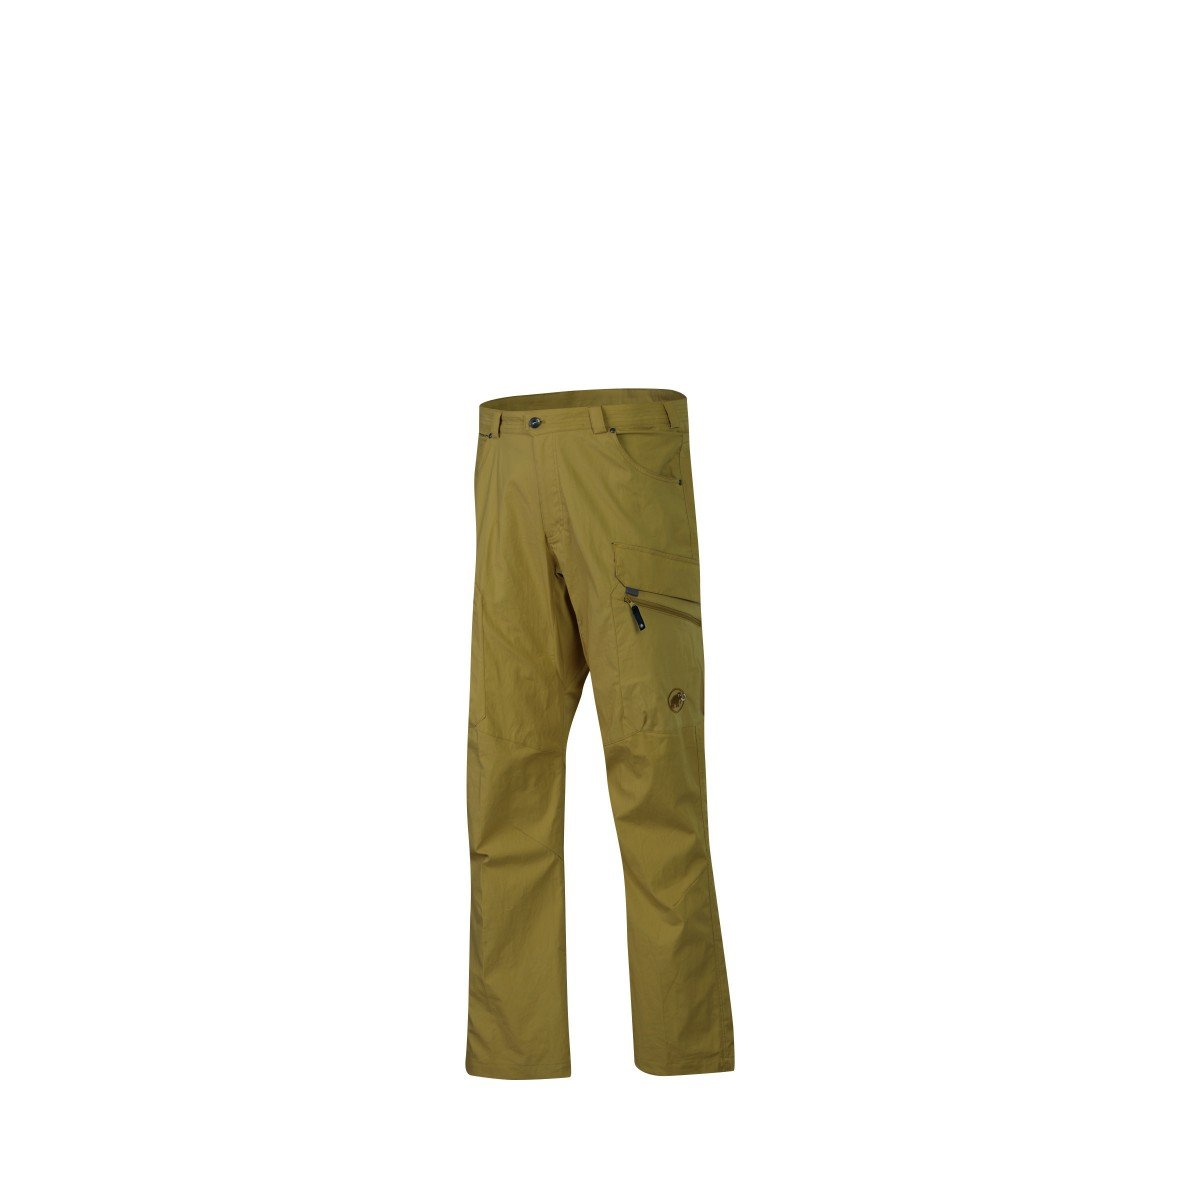 Mammut Trovat - Pants Damens - Trovat Outdoorhose 372630